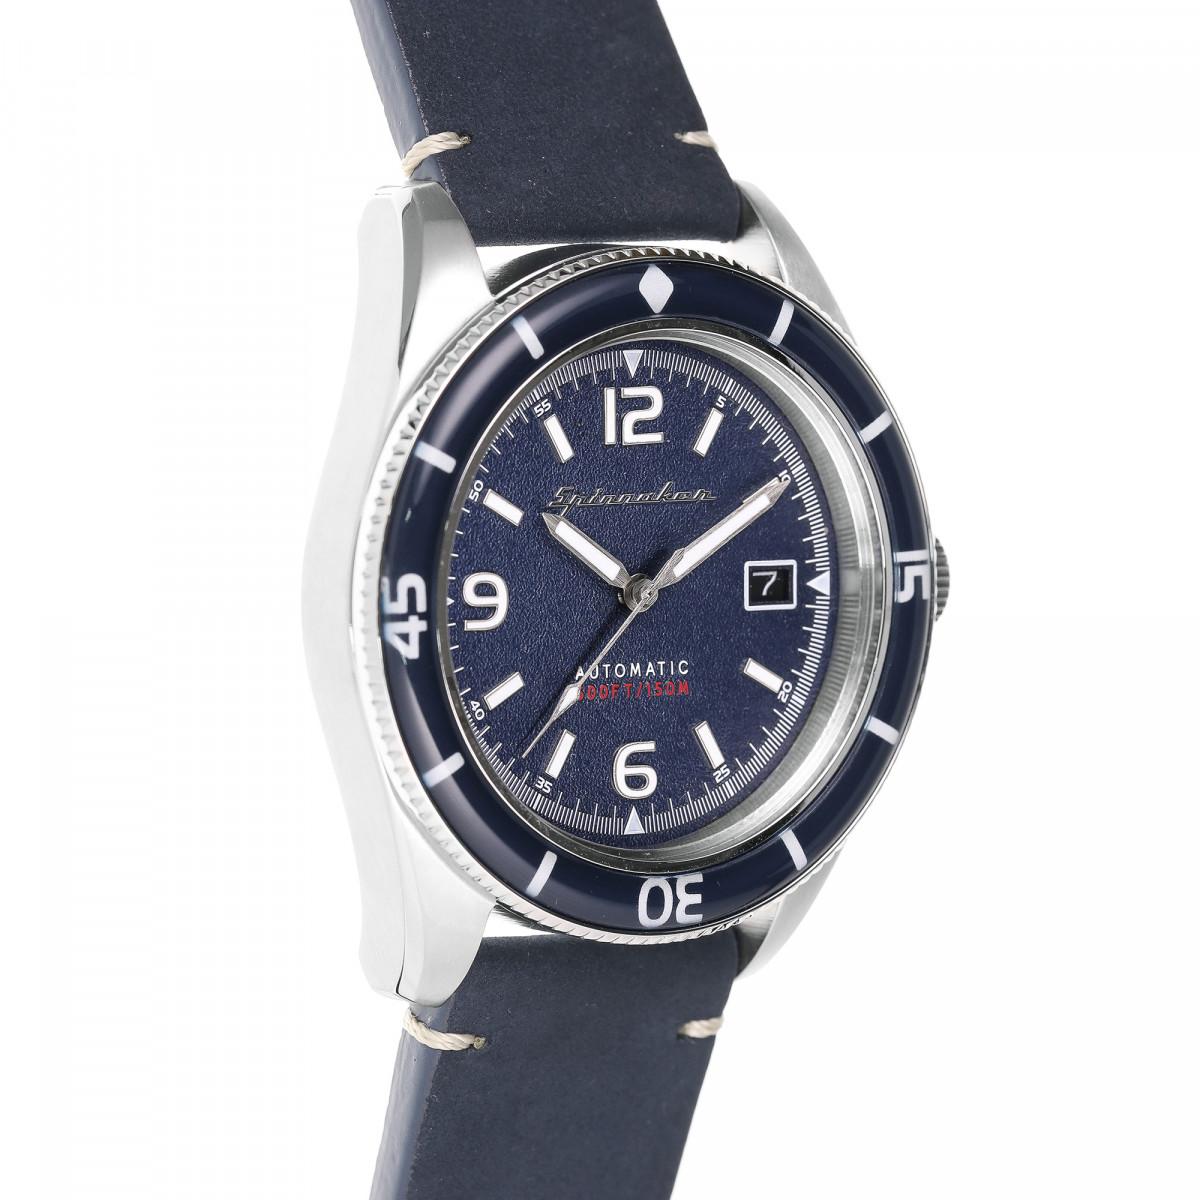 Montre Spinnaker FLEUSS Automatique  - Cadran Bleu - SP-5055-03